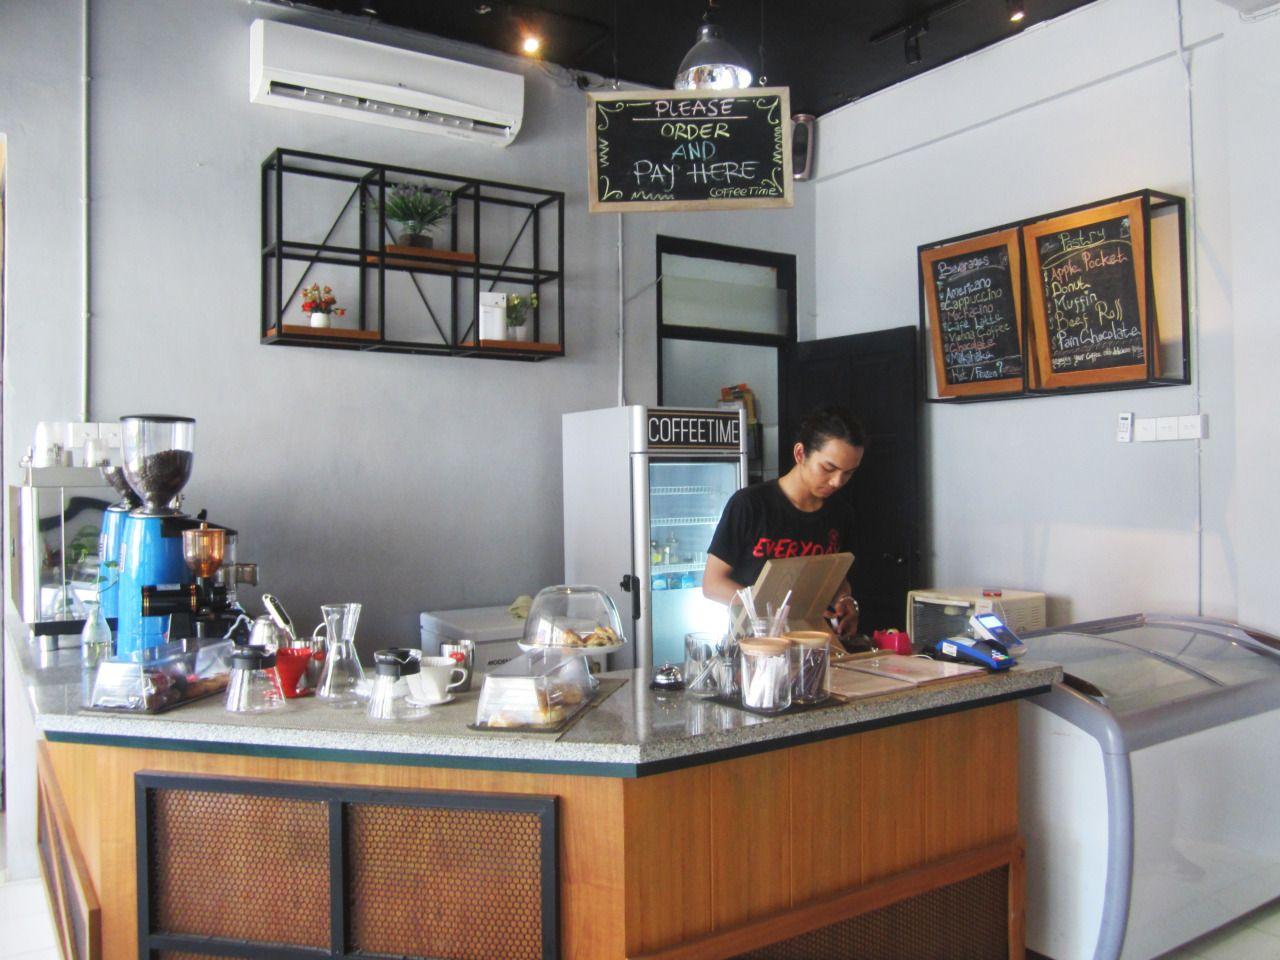 Yogyakarta coffee shop guide. Use